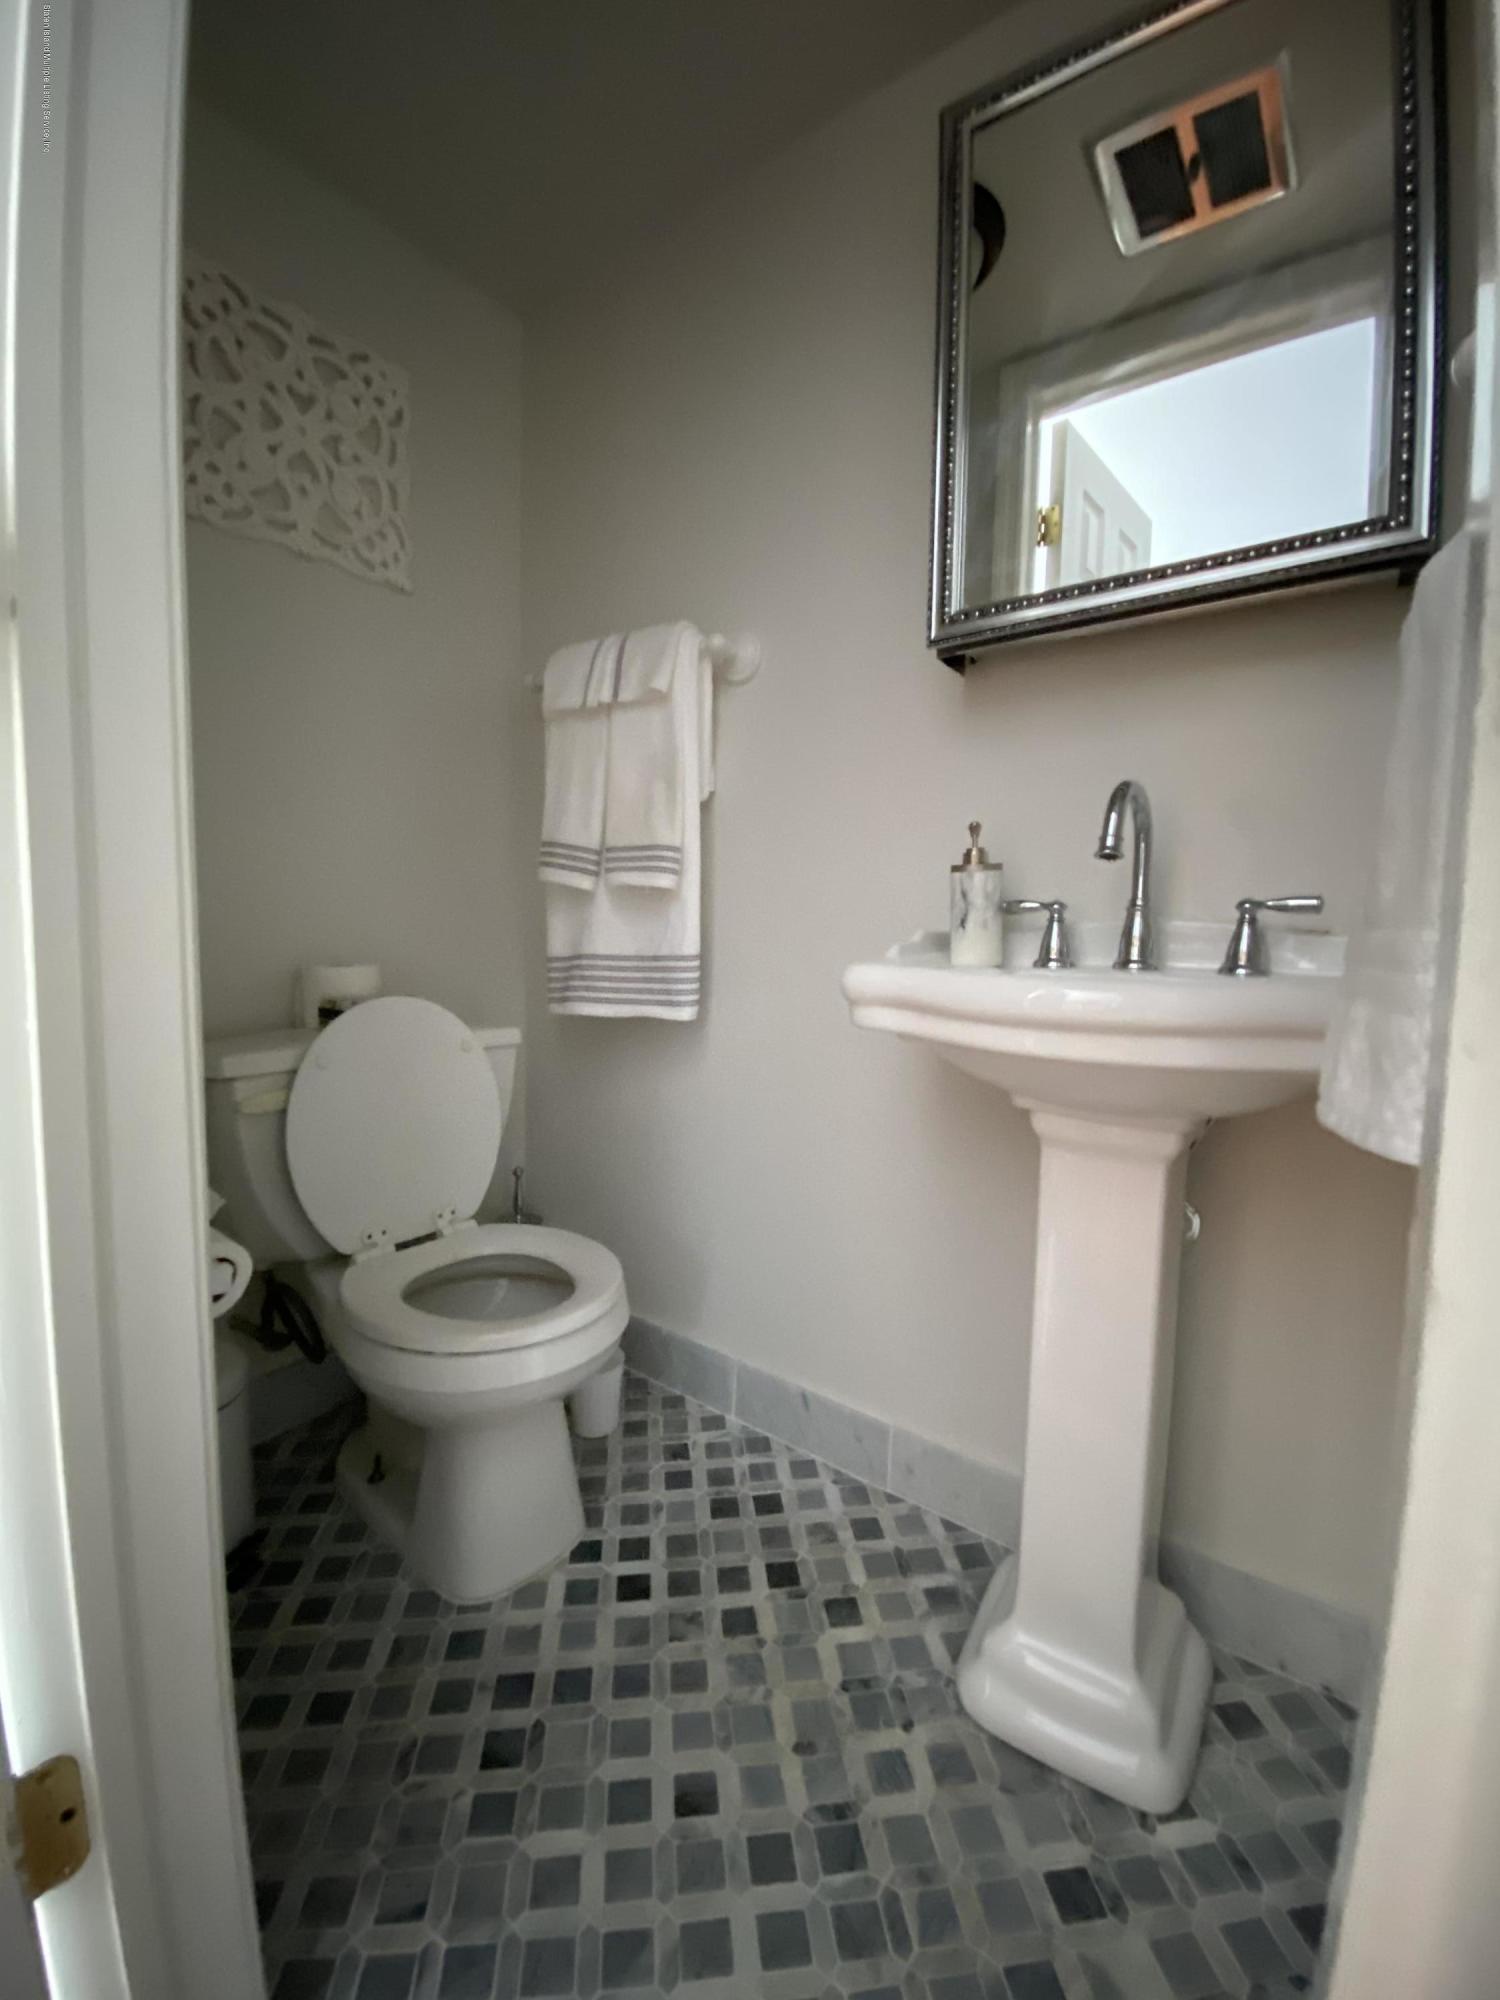 Single Family - Semi-Attached 370 Seaver Avenue  Staten Island, NY 10305, MLS-1136339-8